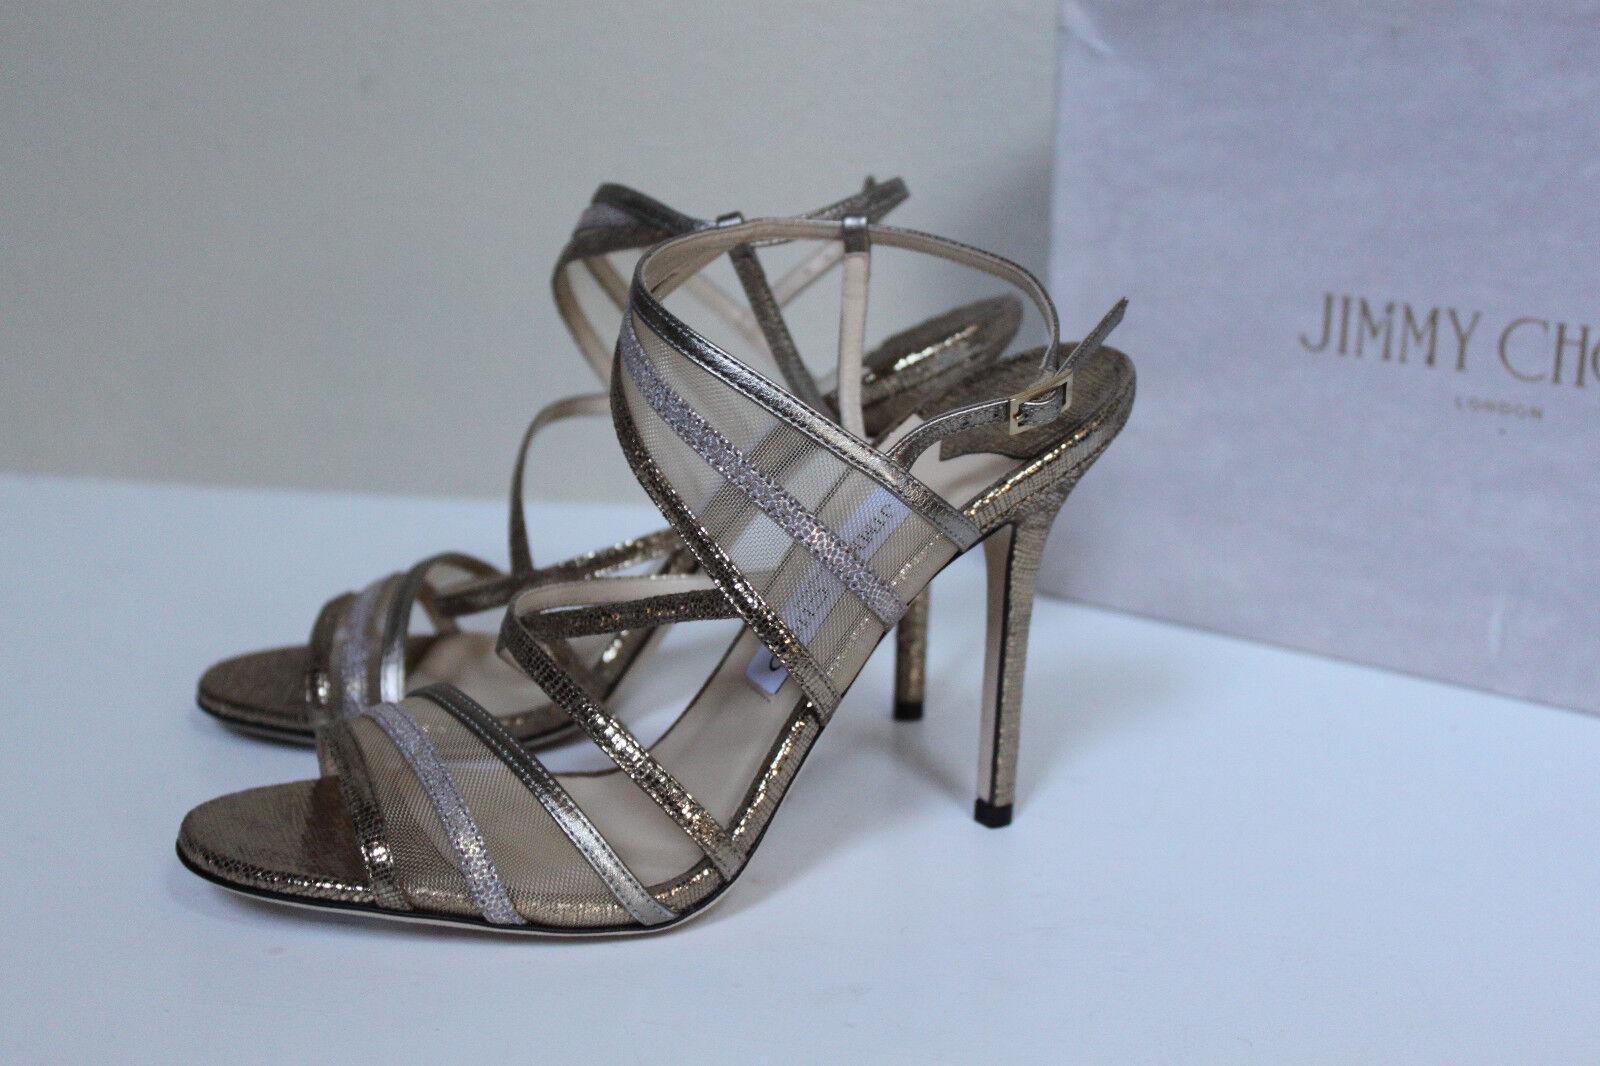 Nuevas Talla 8 38 38 38 Jimmy Choo Visby Bronce Metálico entrecruzadas de Tobillo Sandalia Zapato  de moda